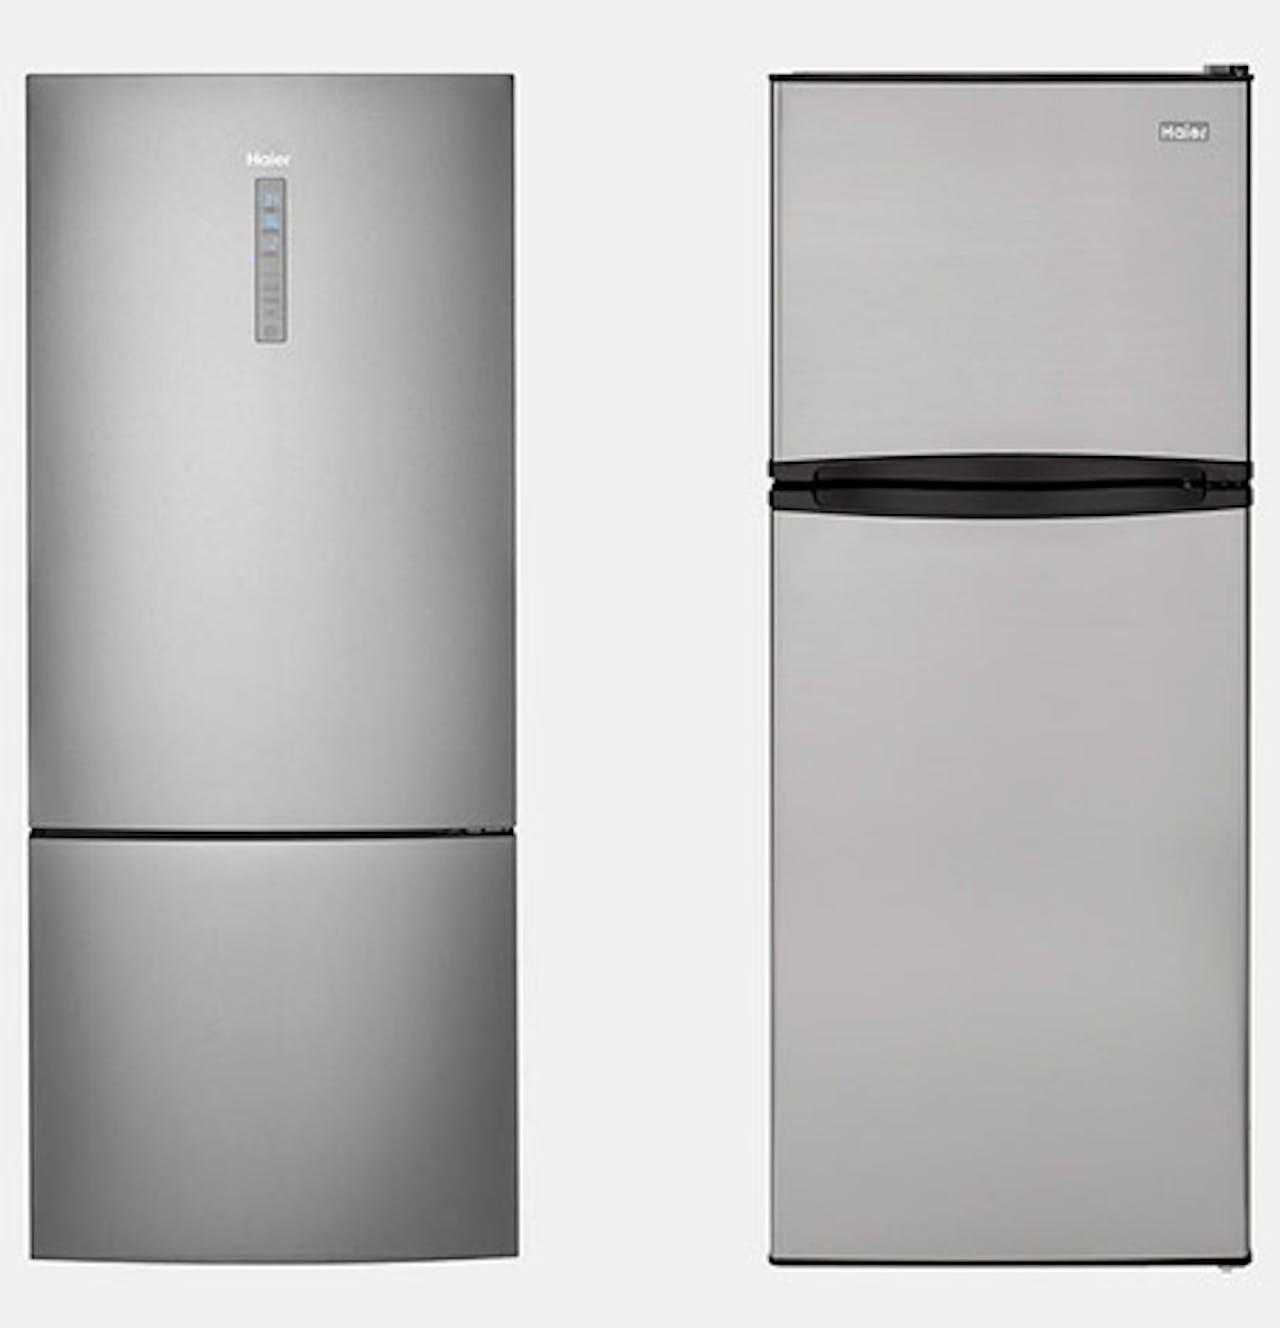 Top or bottom freezer refrigerator options.